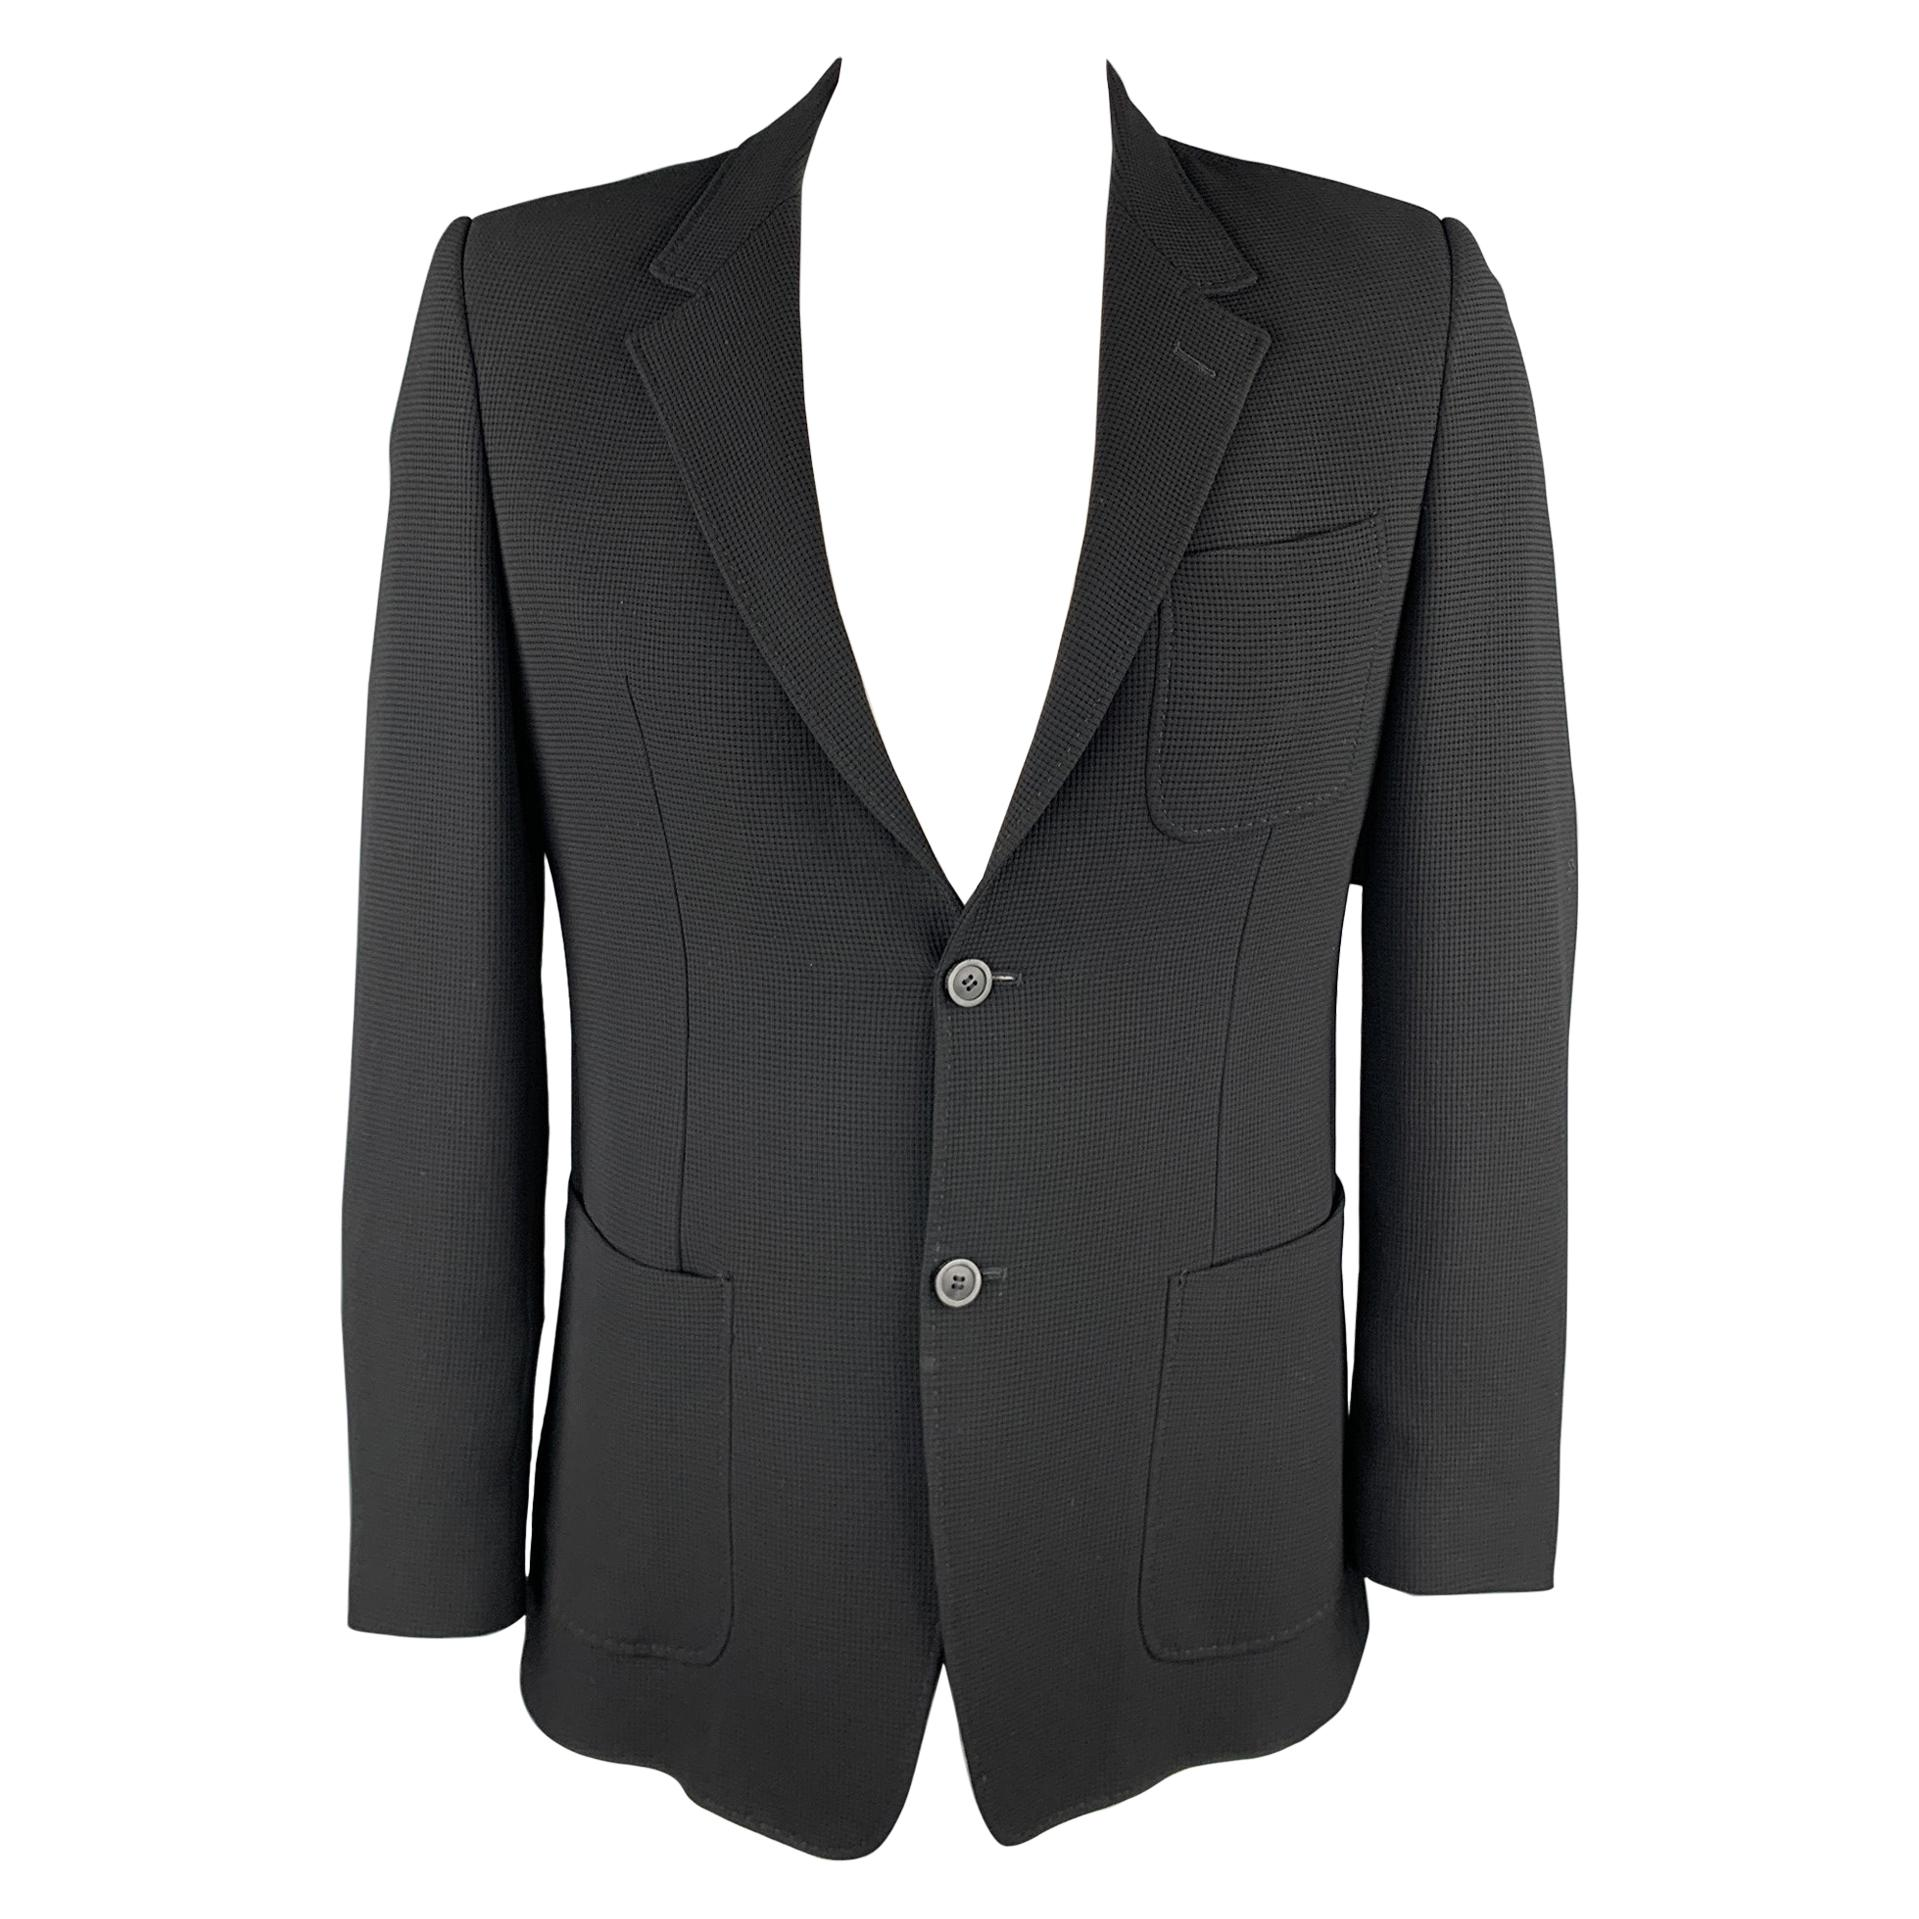 EMPORIO ARMANI Size 44 Black Textured Notch Lapel Sport Coat